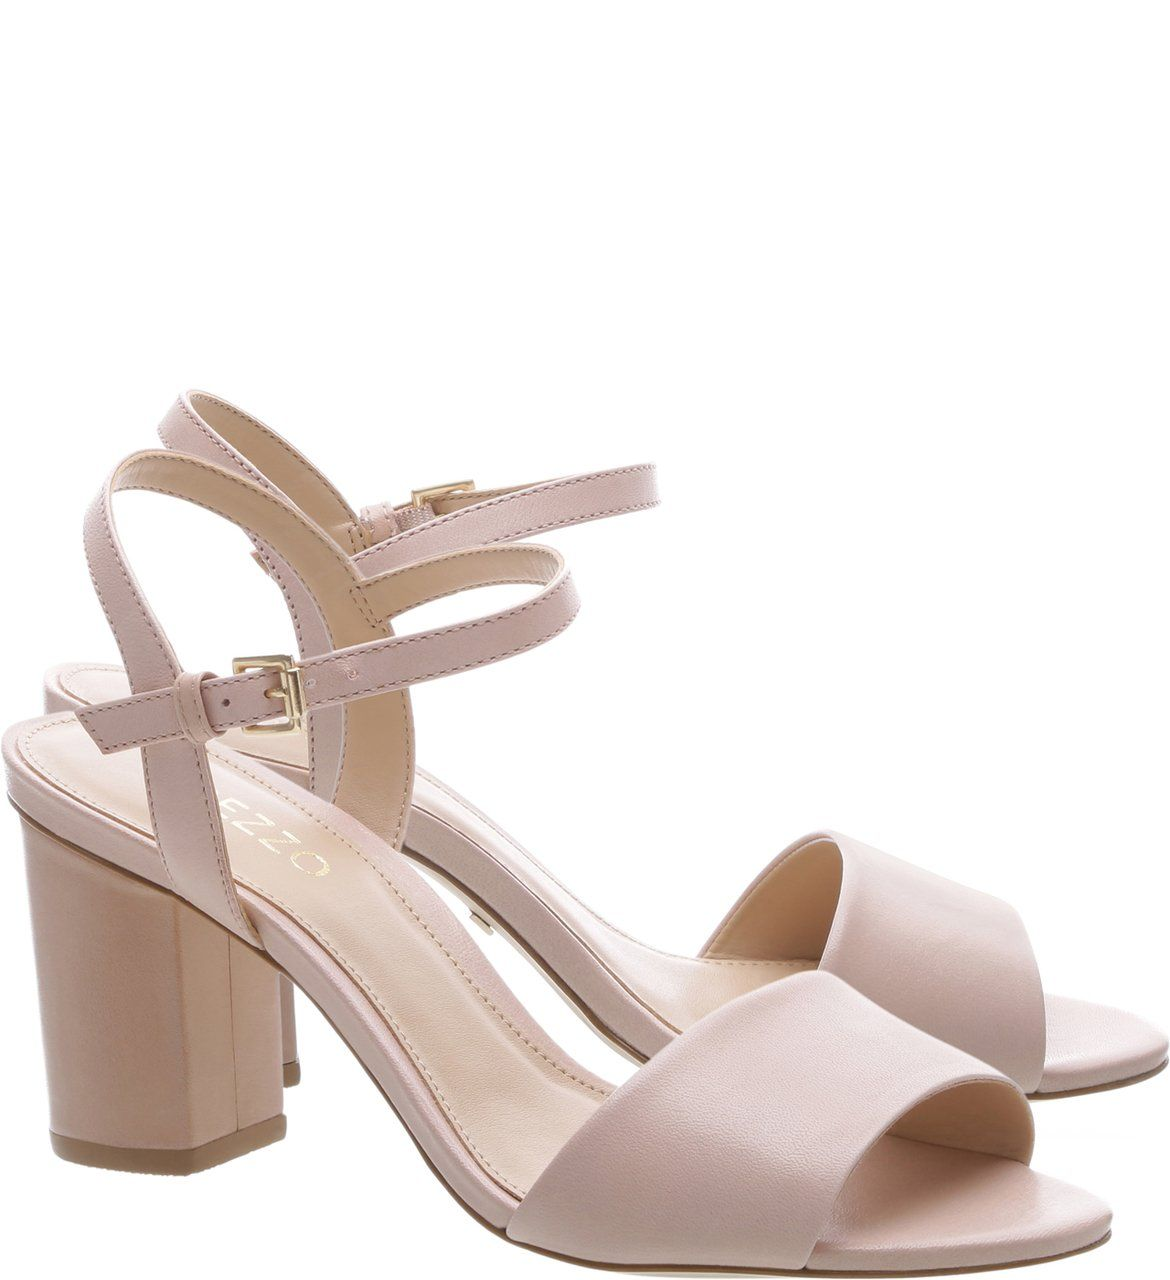 35a27eb73 Sandália Couro Salto Médio Quartzo | Arezzo | women shoes in 2019 ...